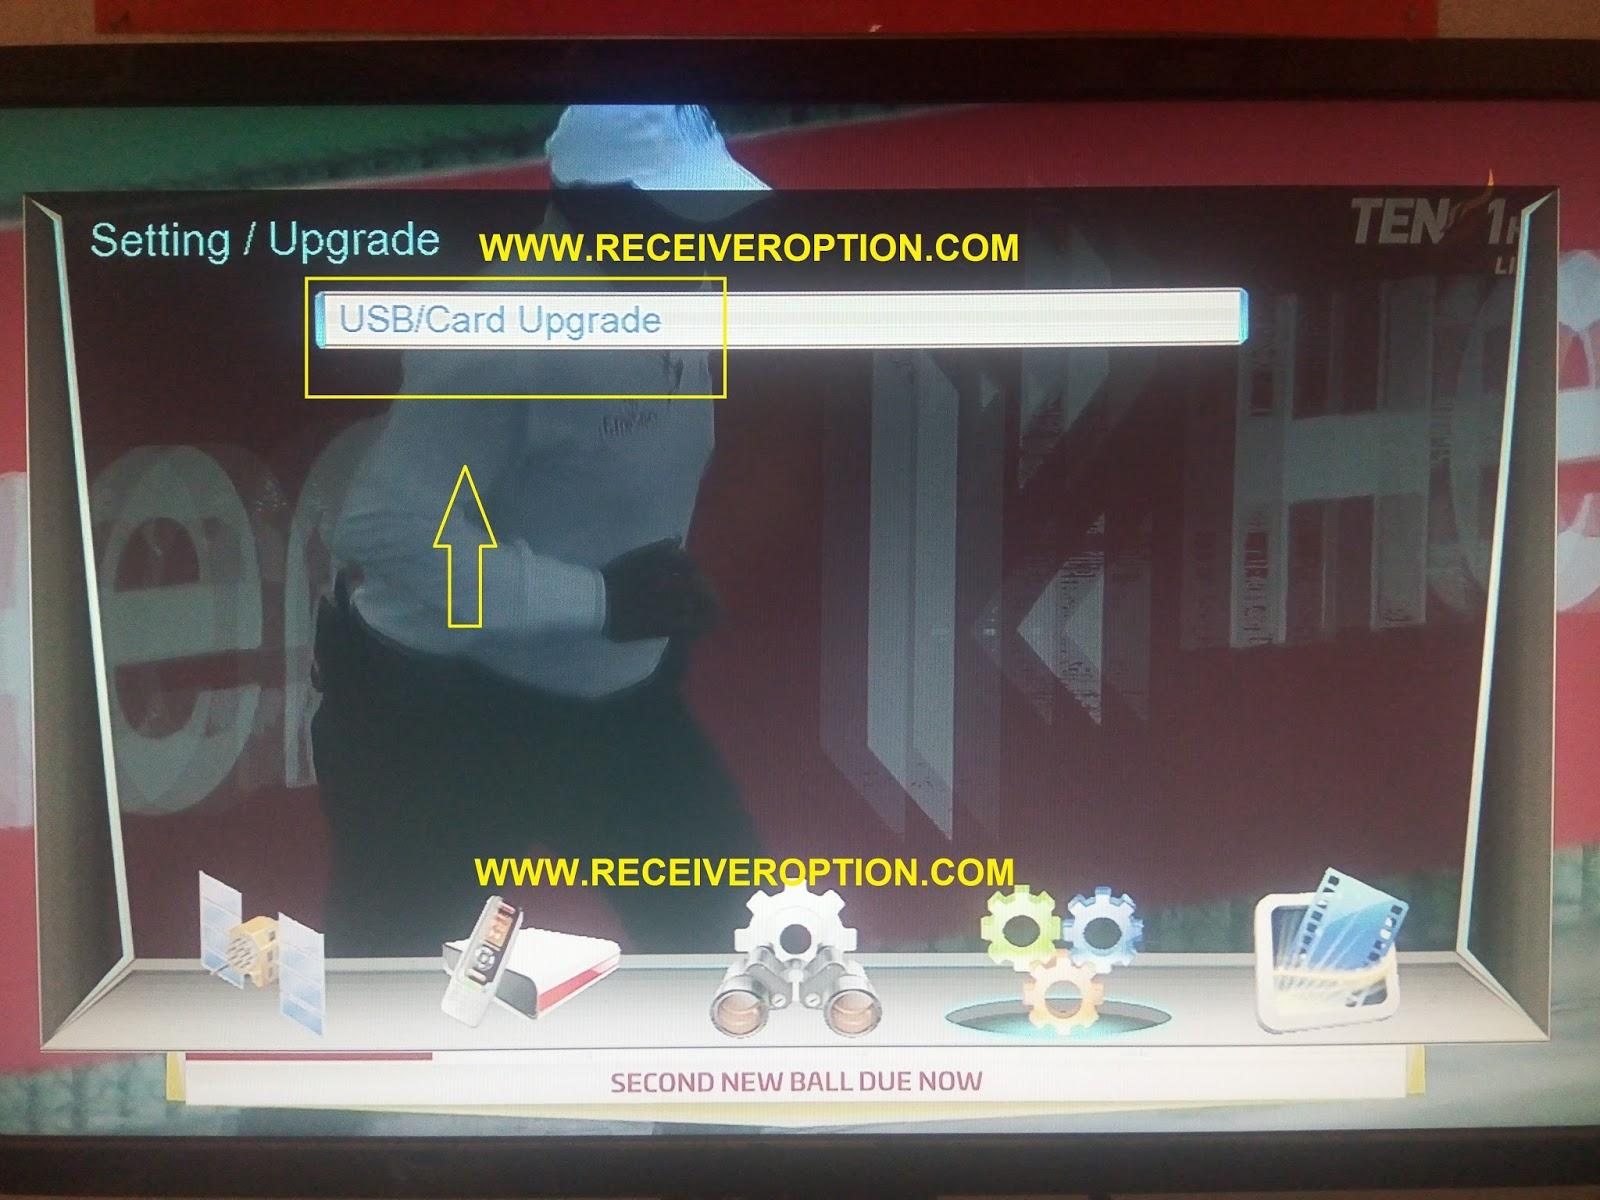 MULTI MEDIA SIM WIFI HD RECEIVER CLINE PROBLEM SOFTWARE - HOW TO